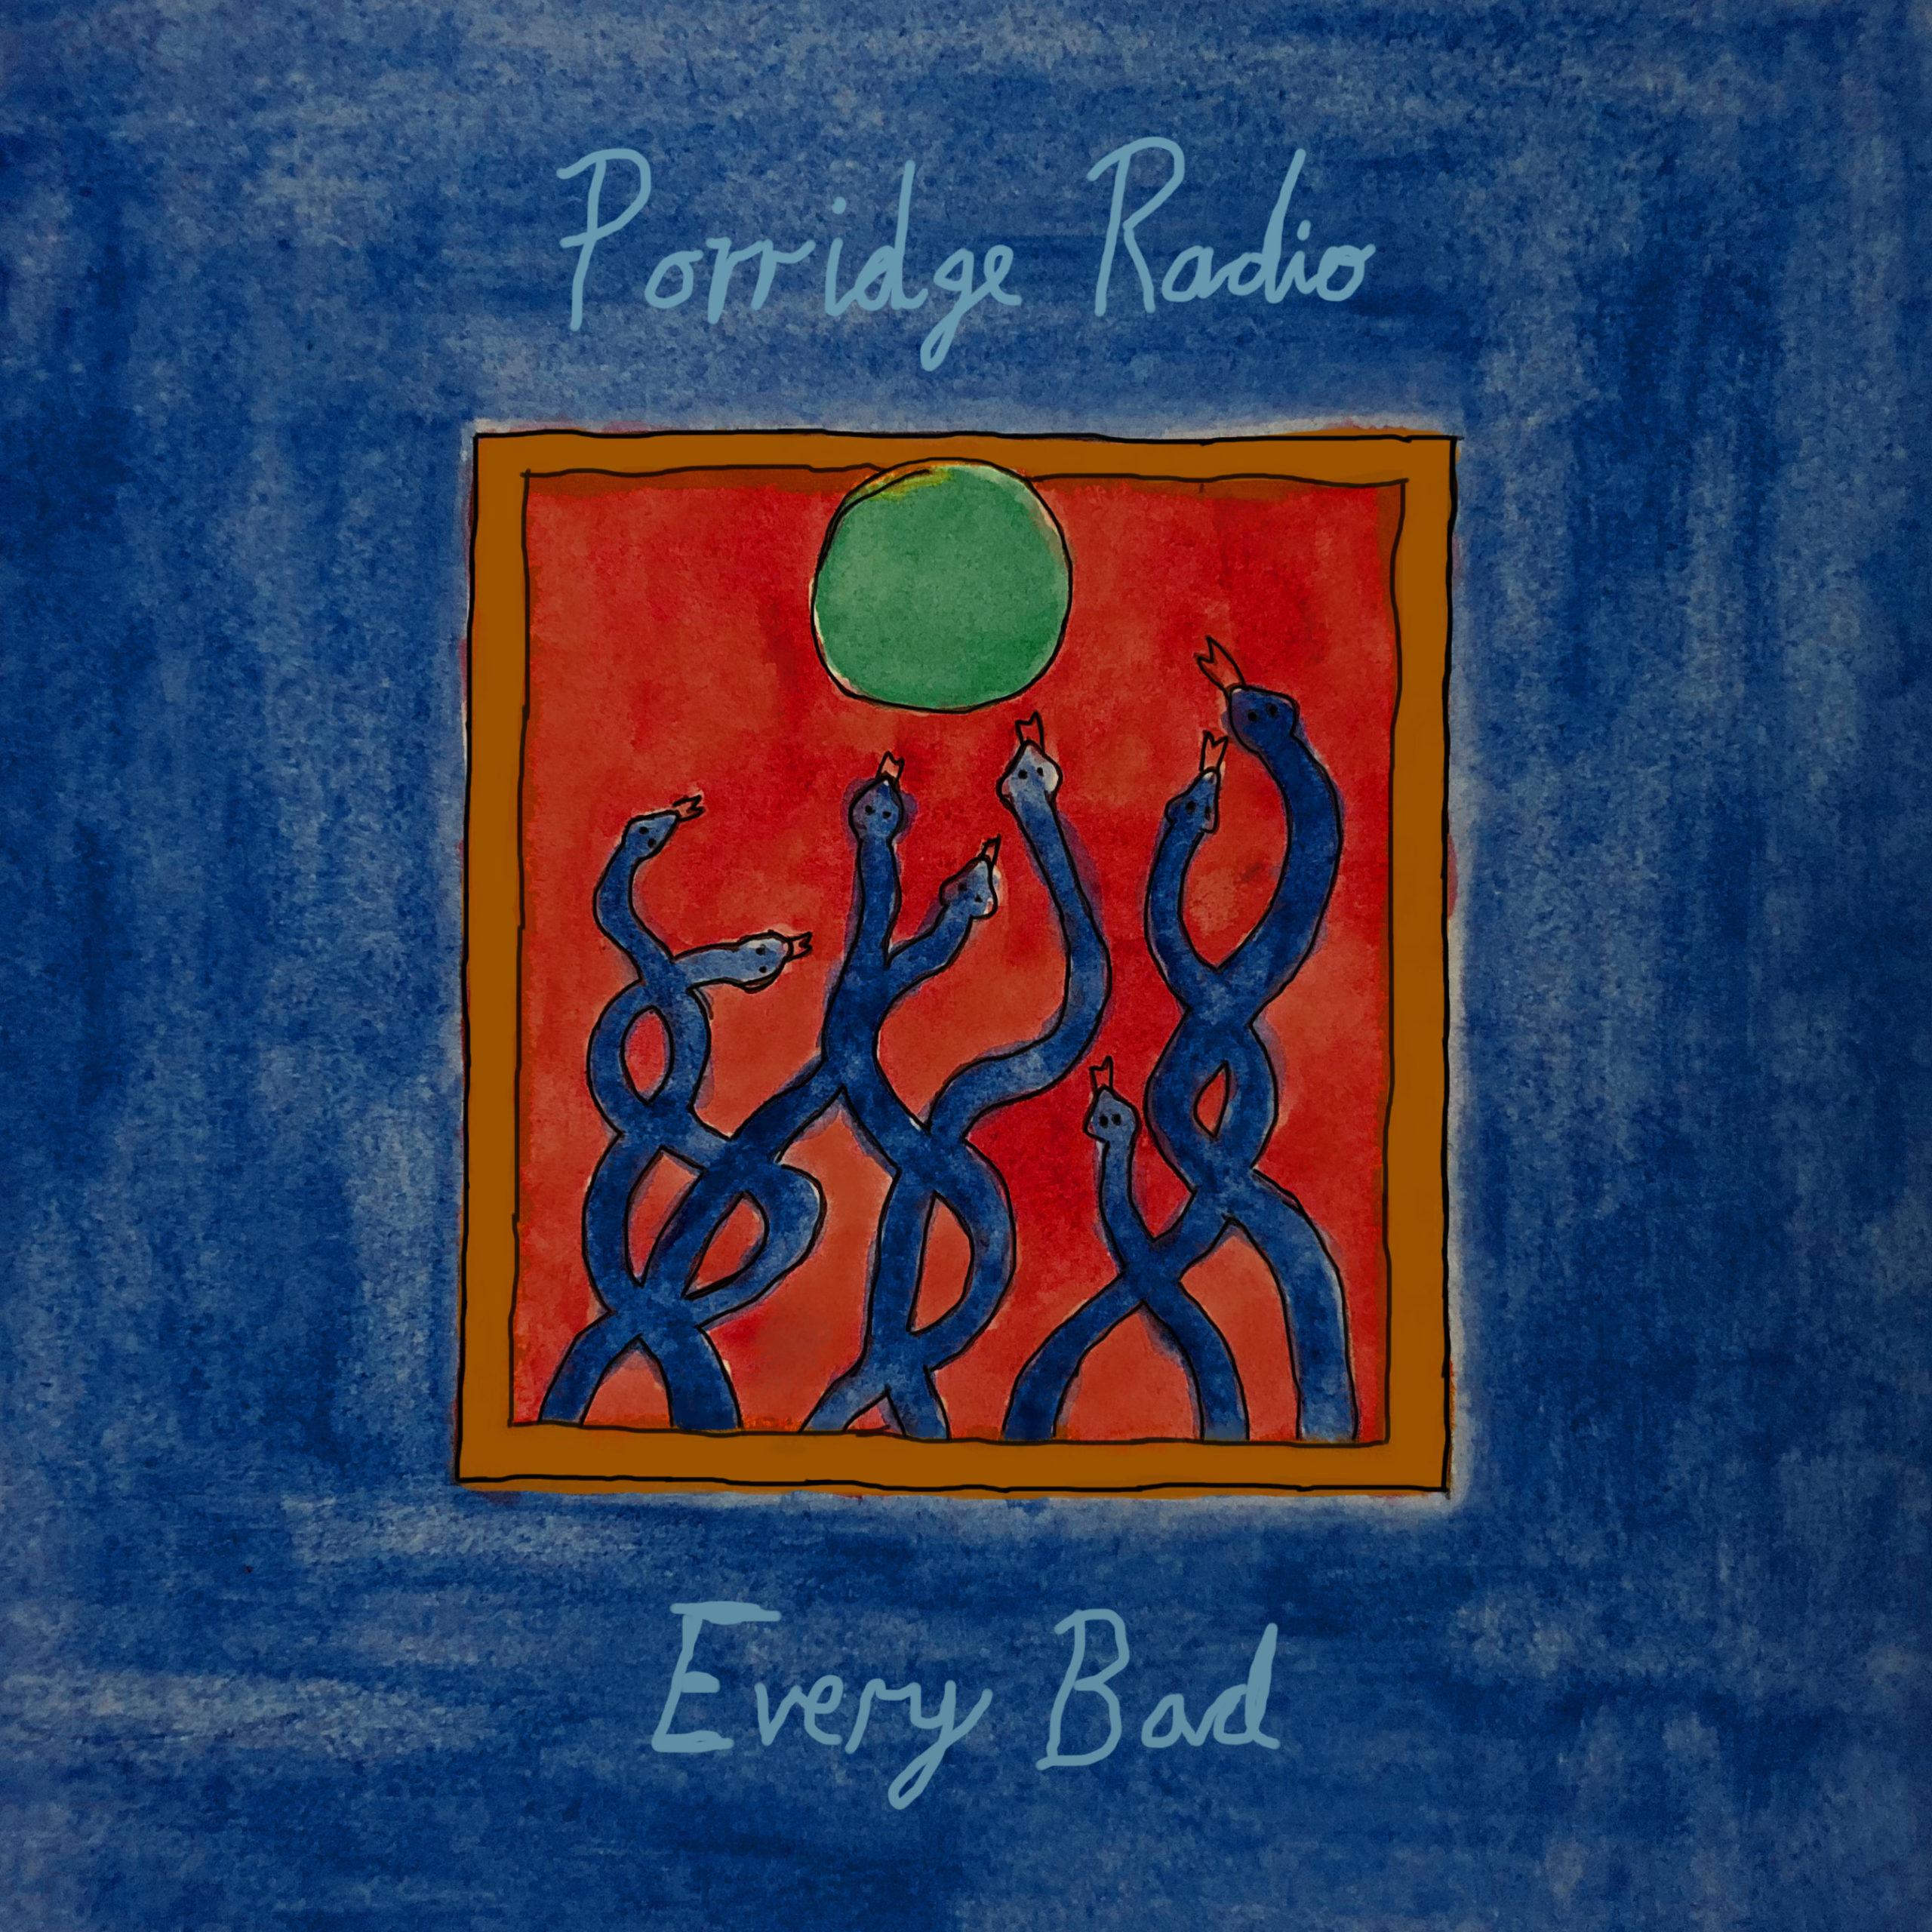 Porridge Radio